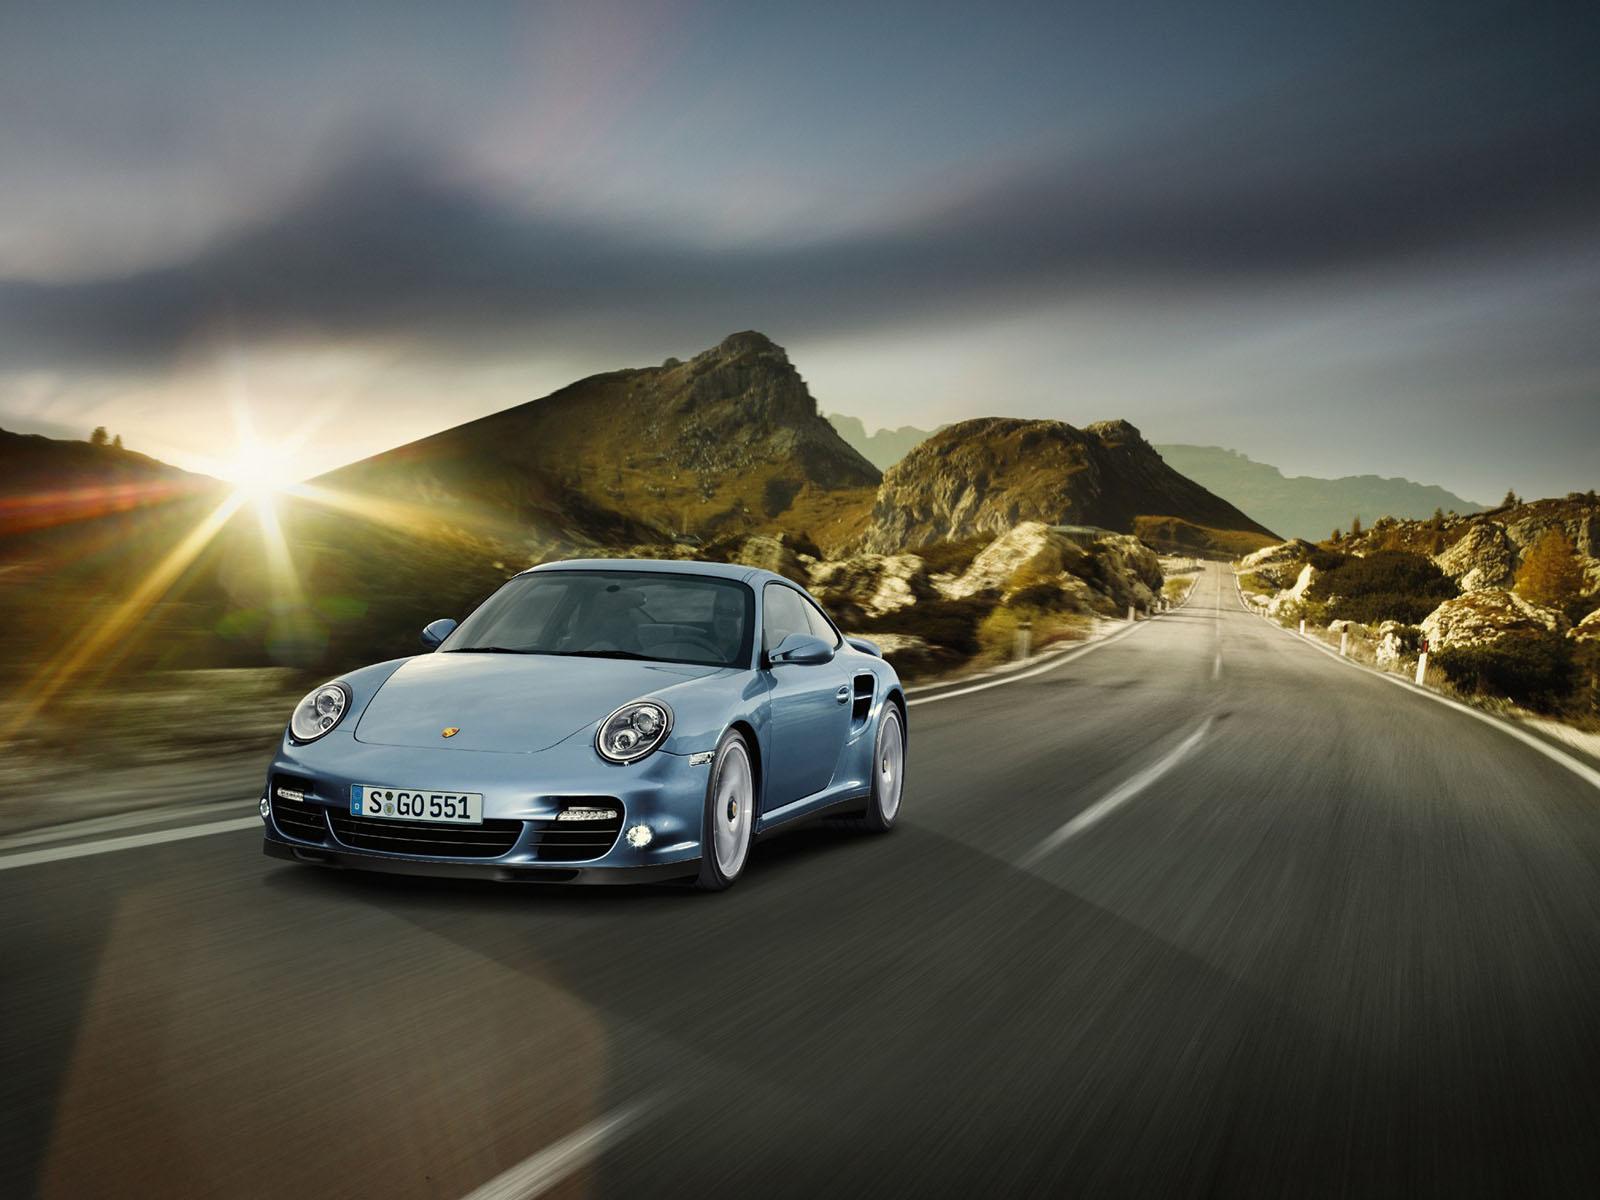 Wallpapers: Porsche 911 Turbo Car Wallpapers